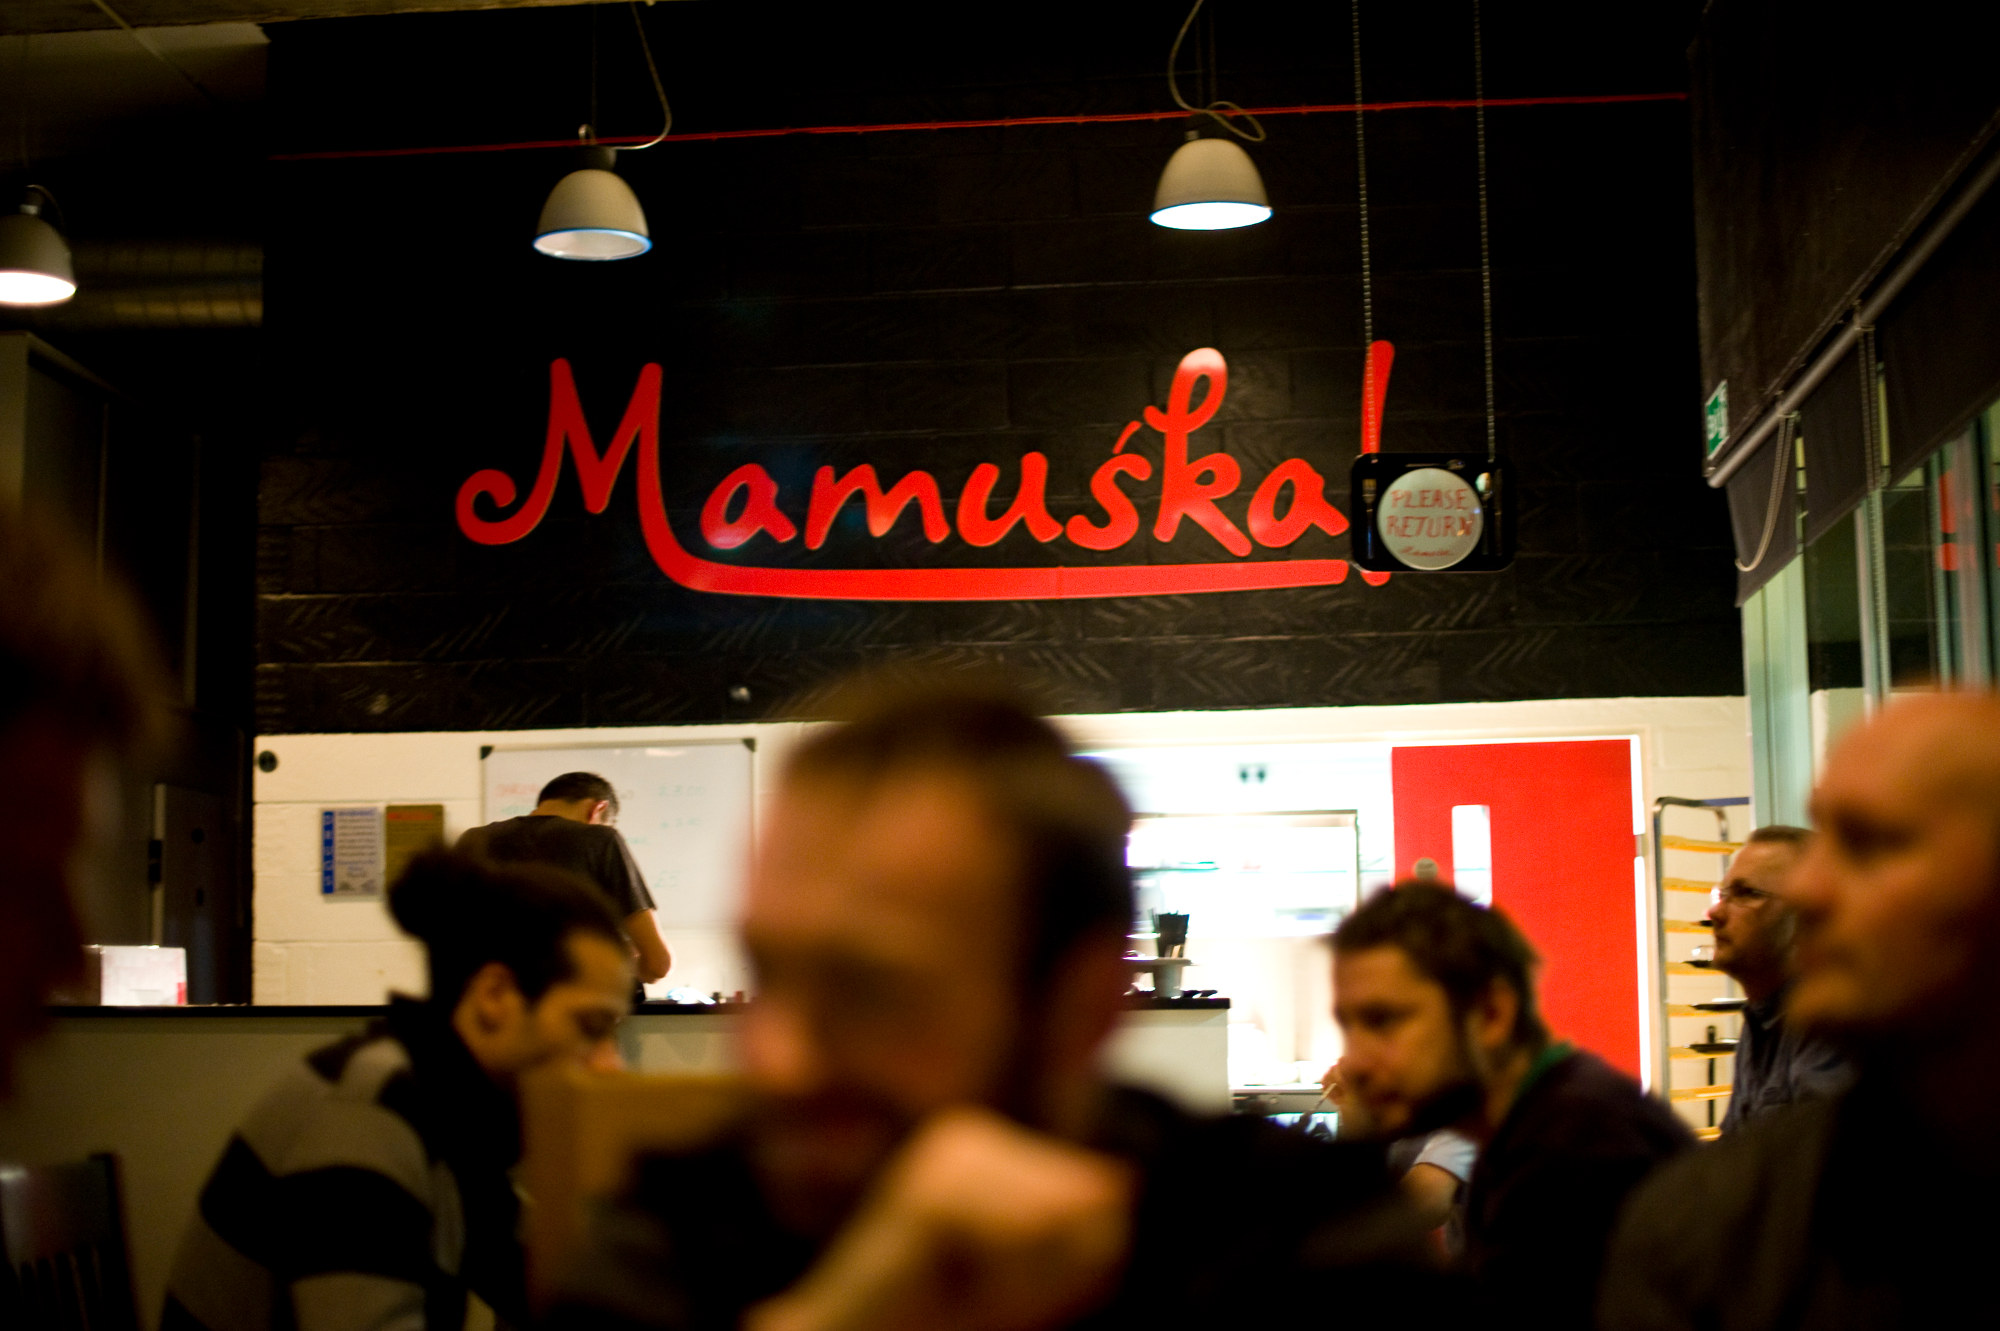 Logo on wall photo 1